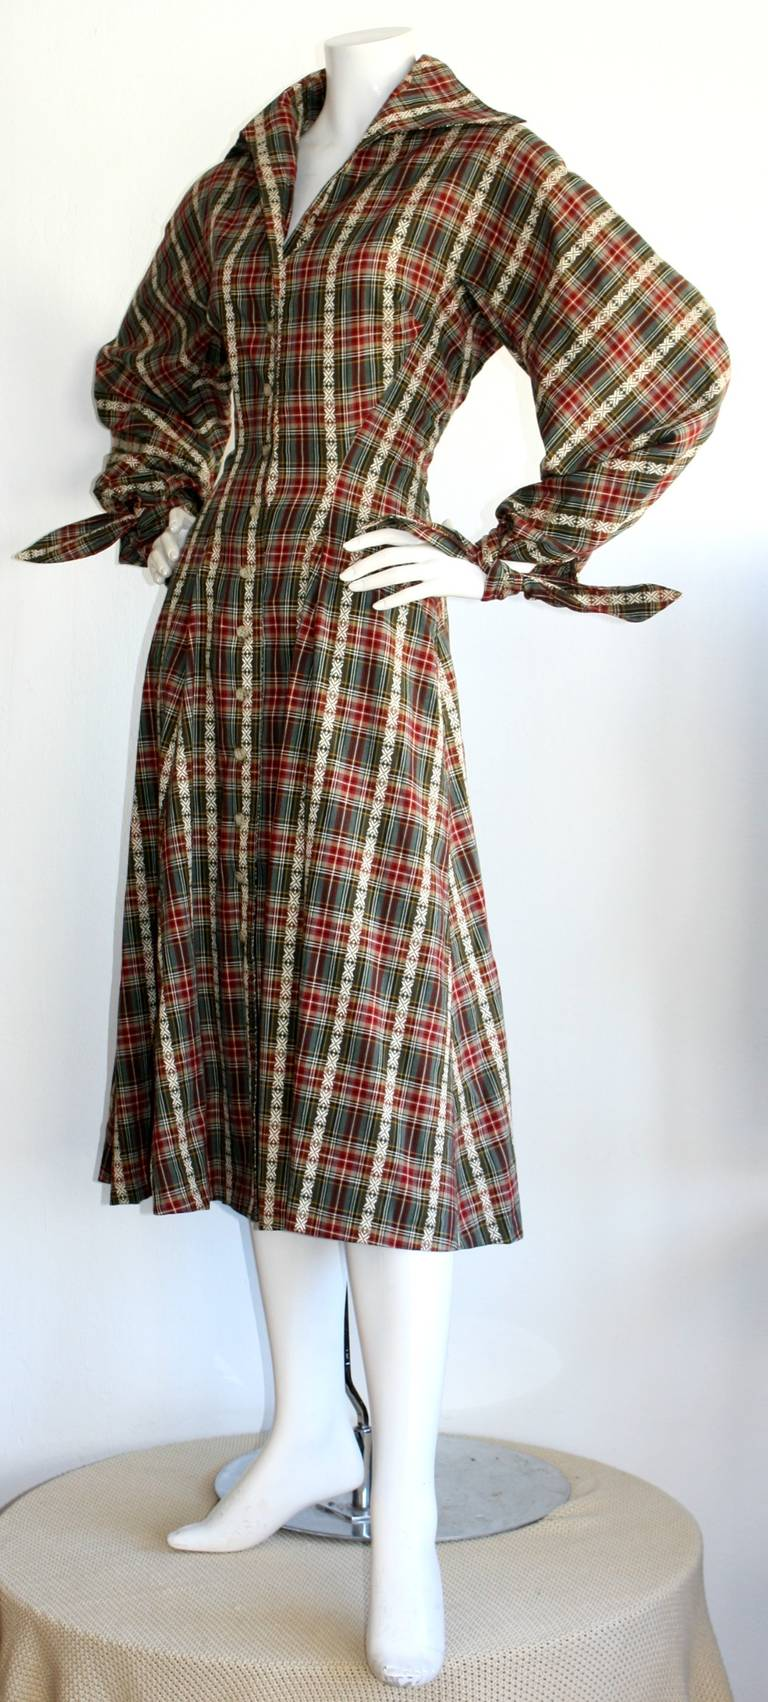 Vintage Byron Lars Tartan Plaid Tie Bow Shirt Dress 3